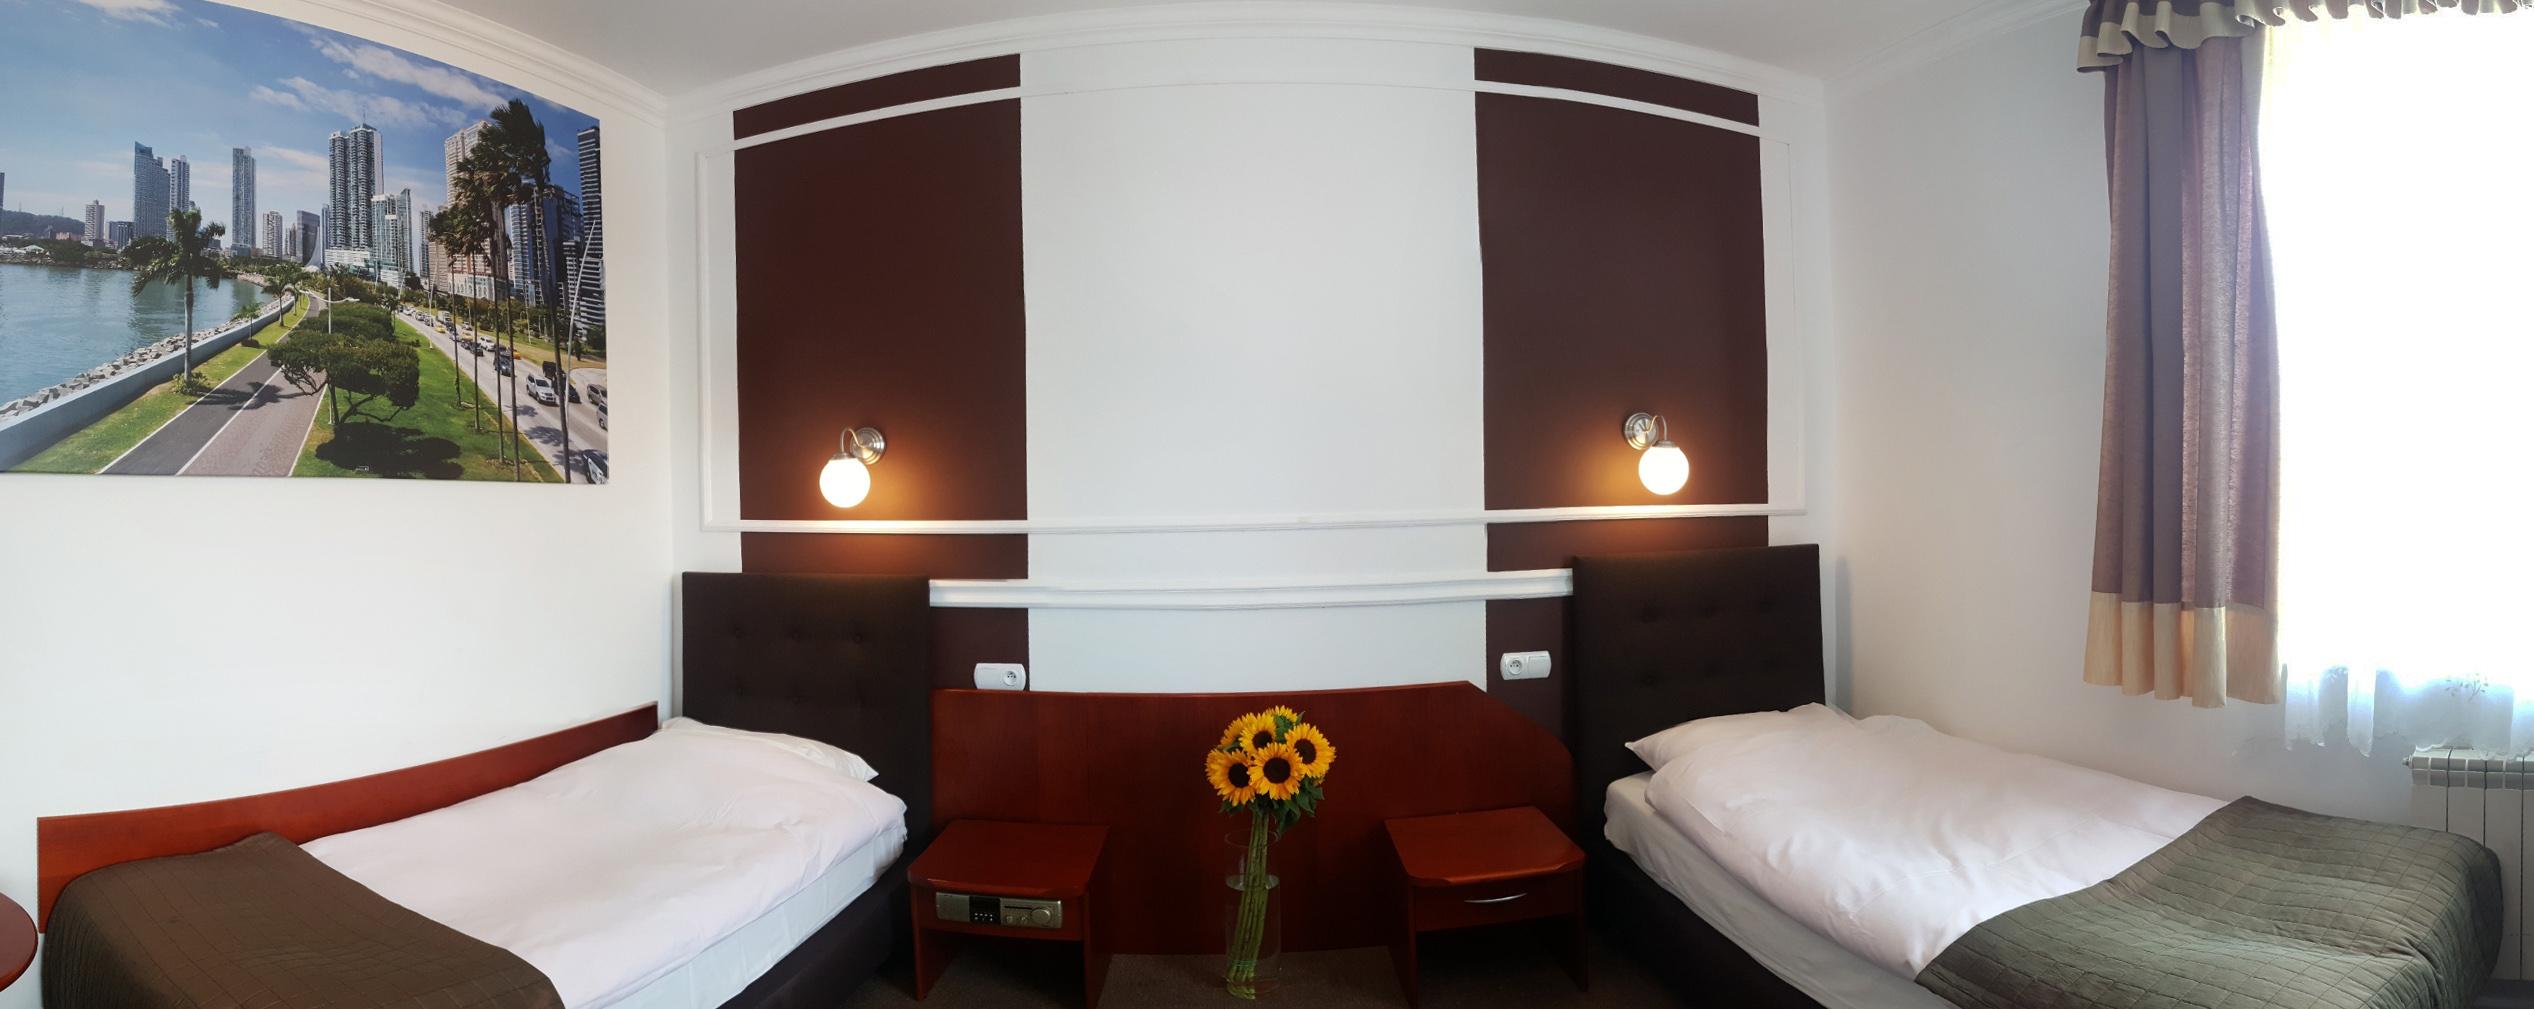 hotel granada ostrow